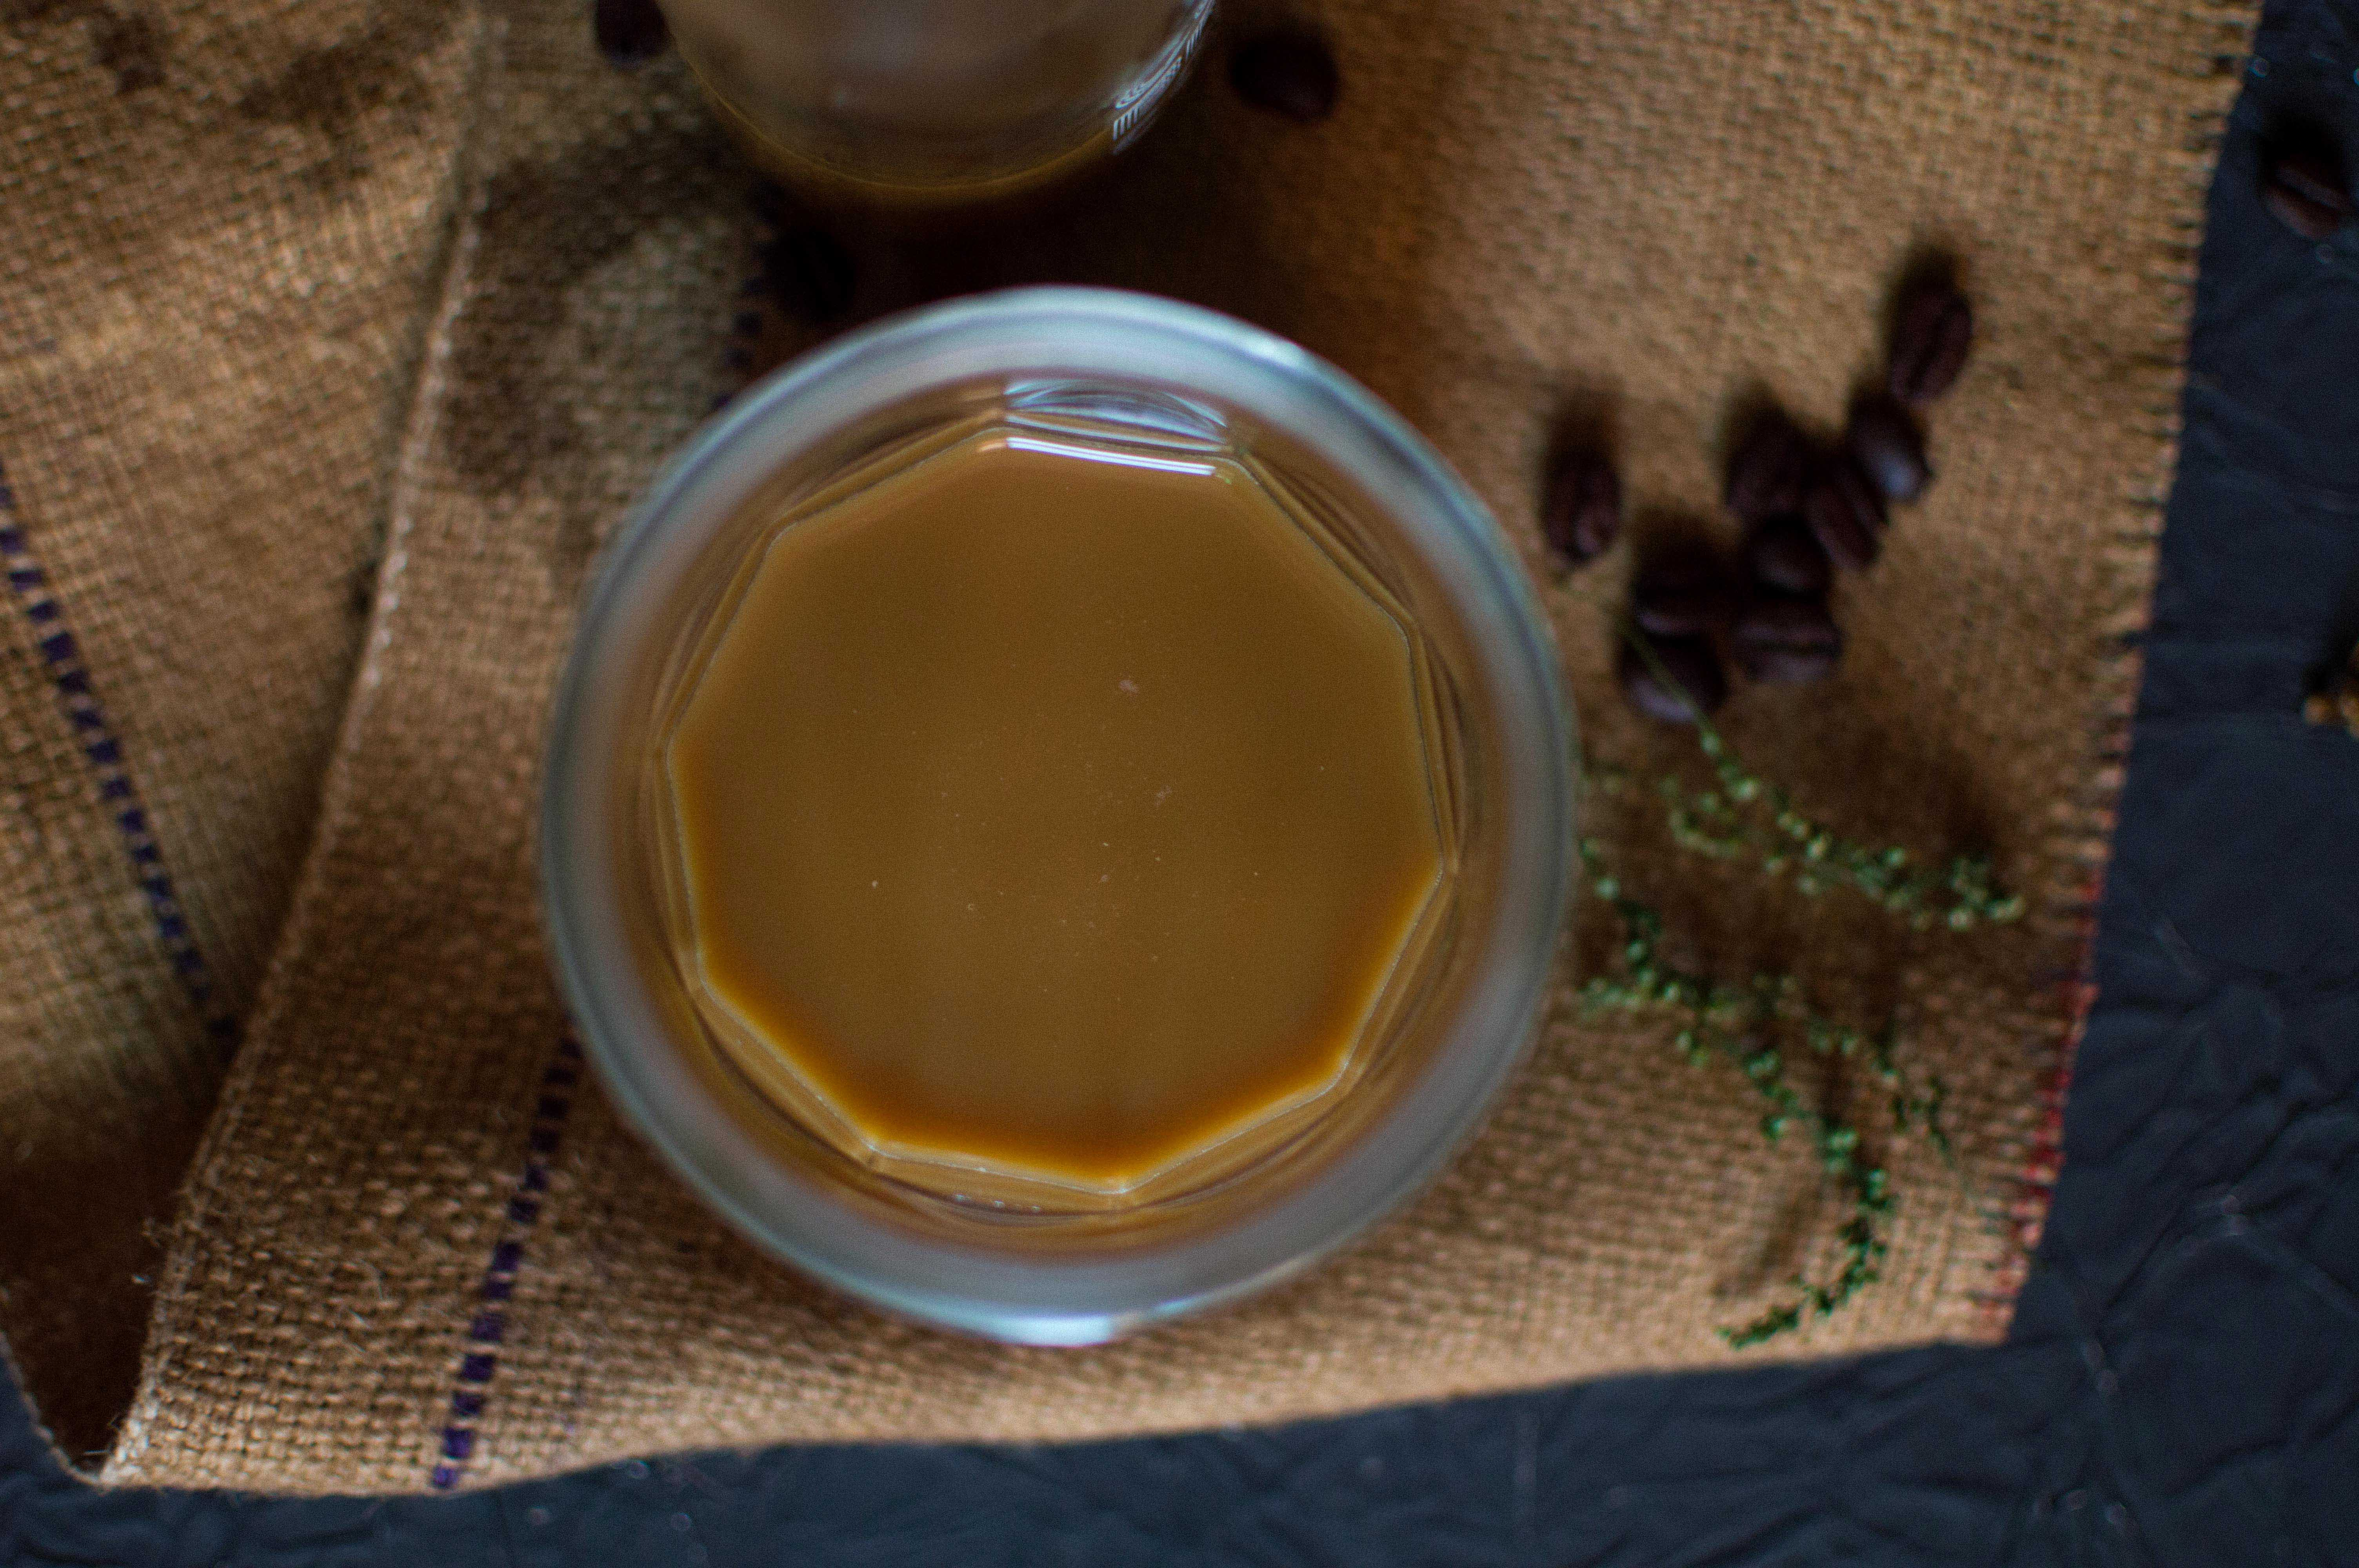 Third Roast Vietnamese Coffee